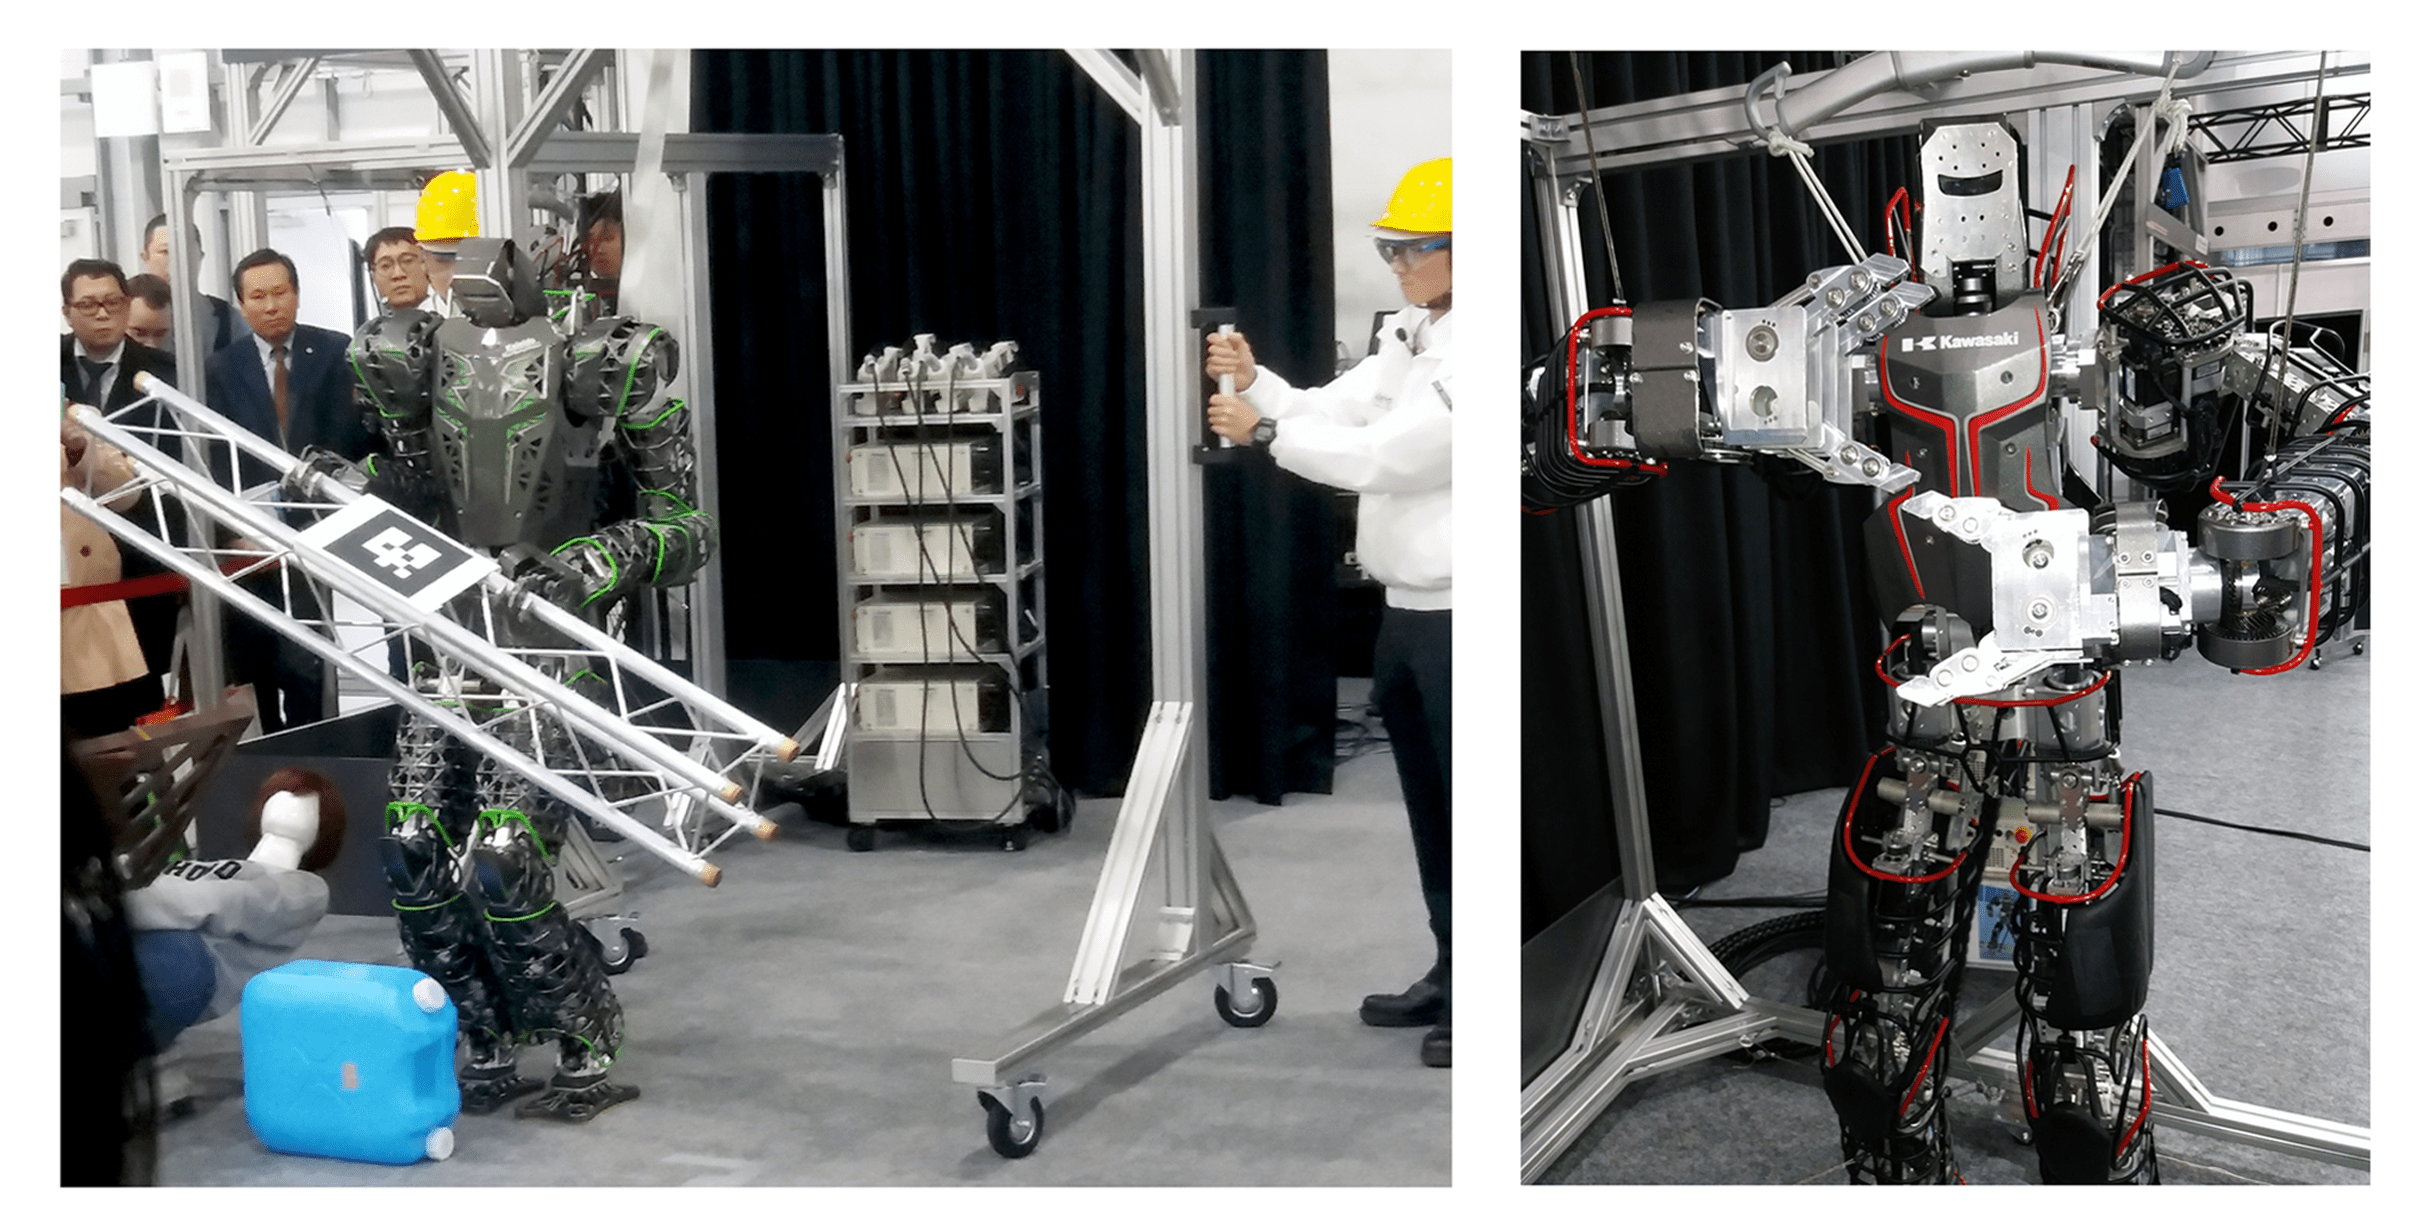 Kaleido robot humanoide